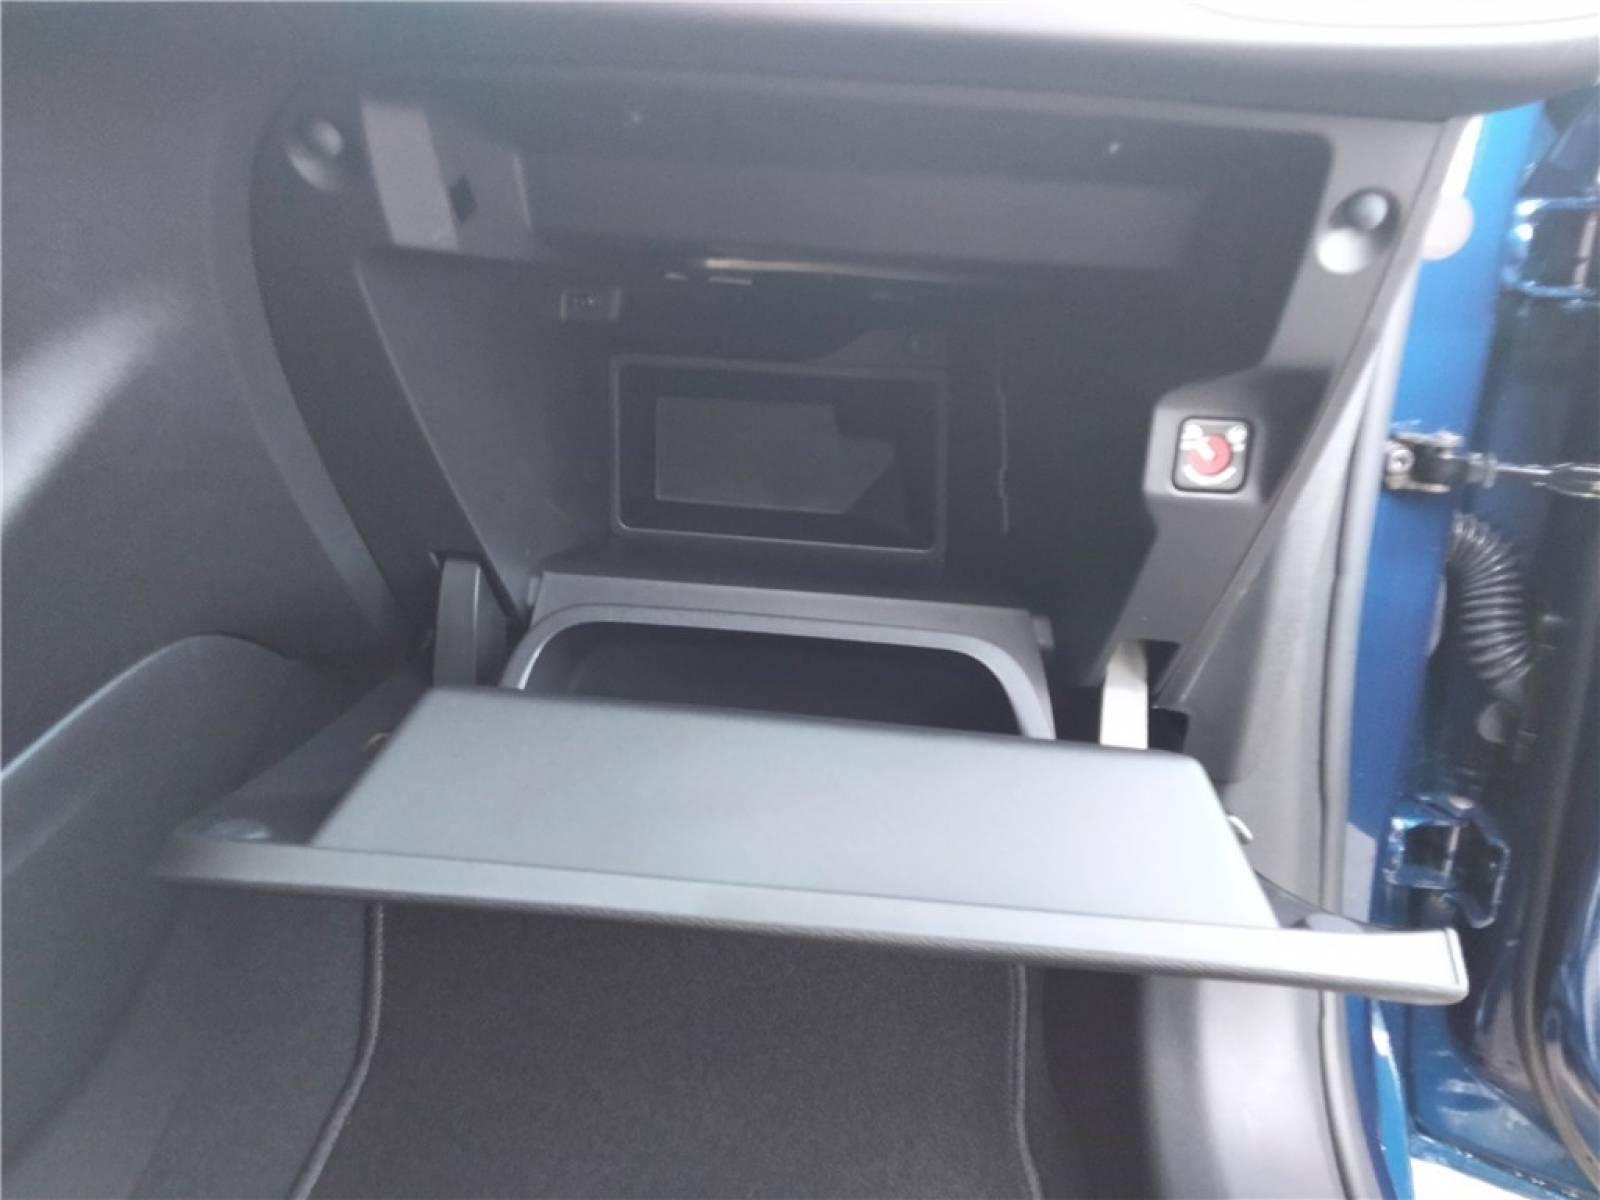 OPEL Corsa 1.2 Turbo 100 ch BVM6 - véhicule d'occasion - Groupe Guillet - Opel Magicauto - Chalon-sur-Saône - 71380 - Saint-Marcel - 19